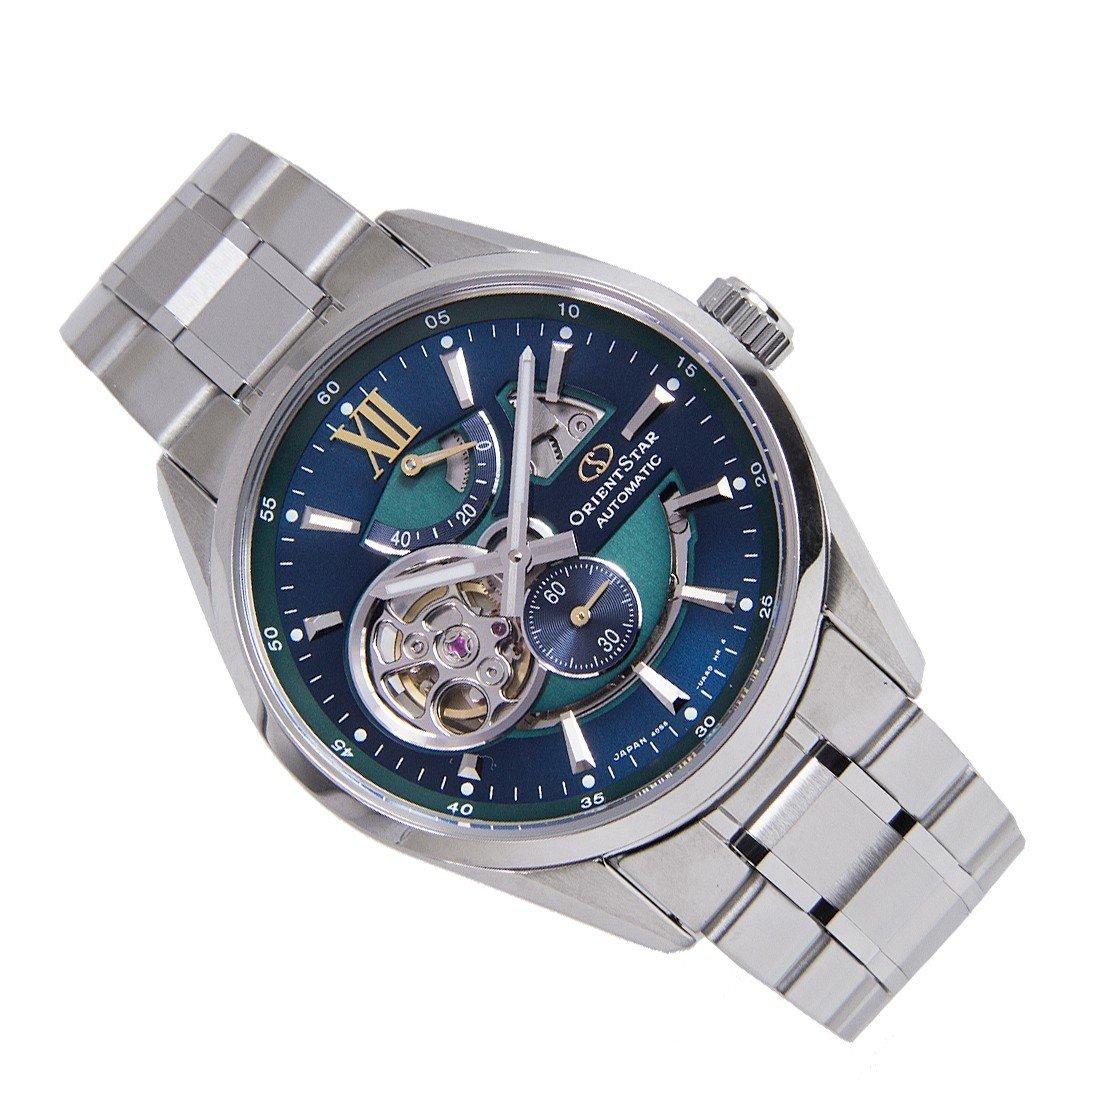 reloj hombre automático Orient Star RE-DK0001L Semi Skeleton zafiro Limited Edition